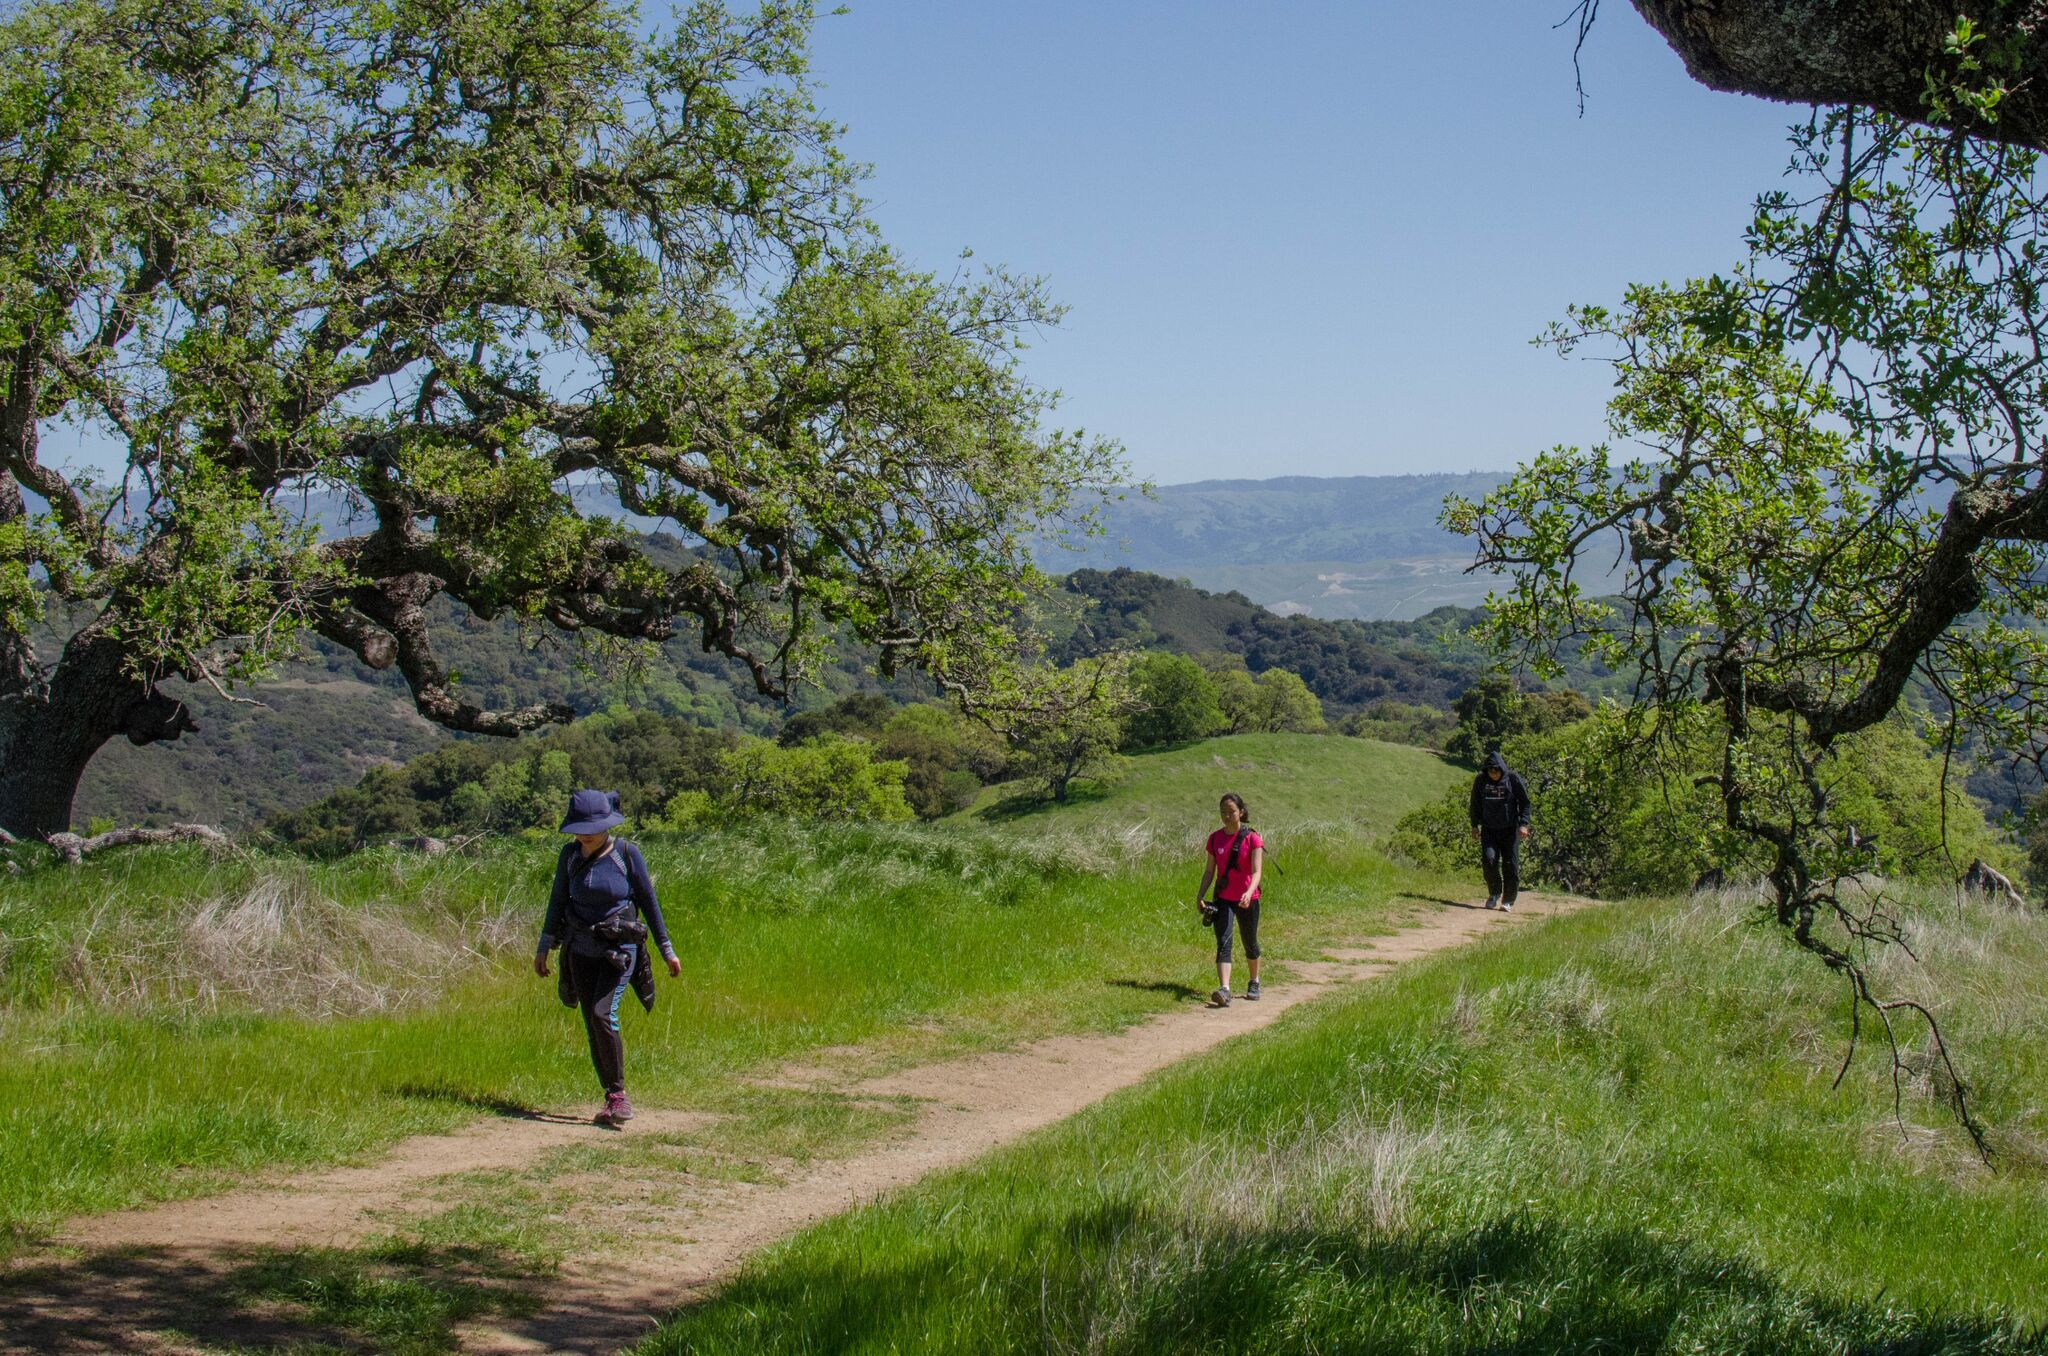 Mayfair-Trail_Rancho-Canada-del-Oro-Open-Space-Preserve_Cassie-Kifer-39_preview